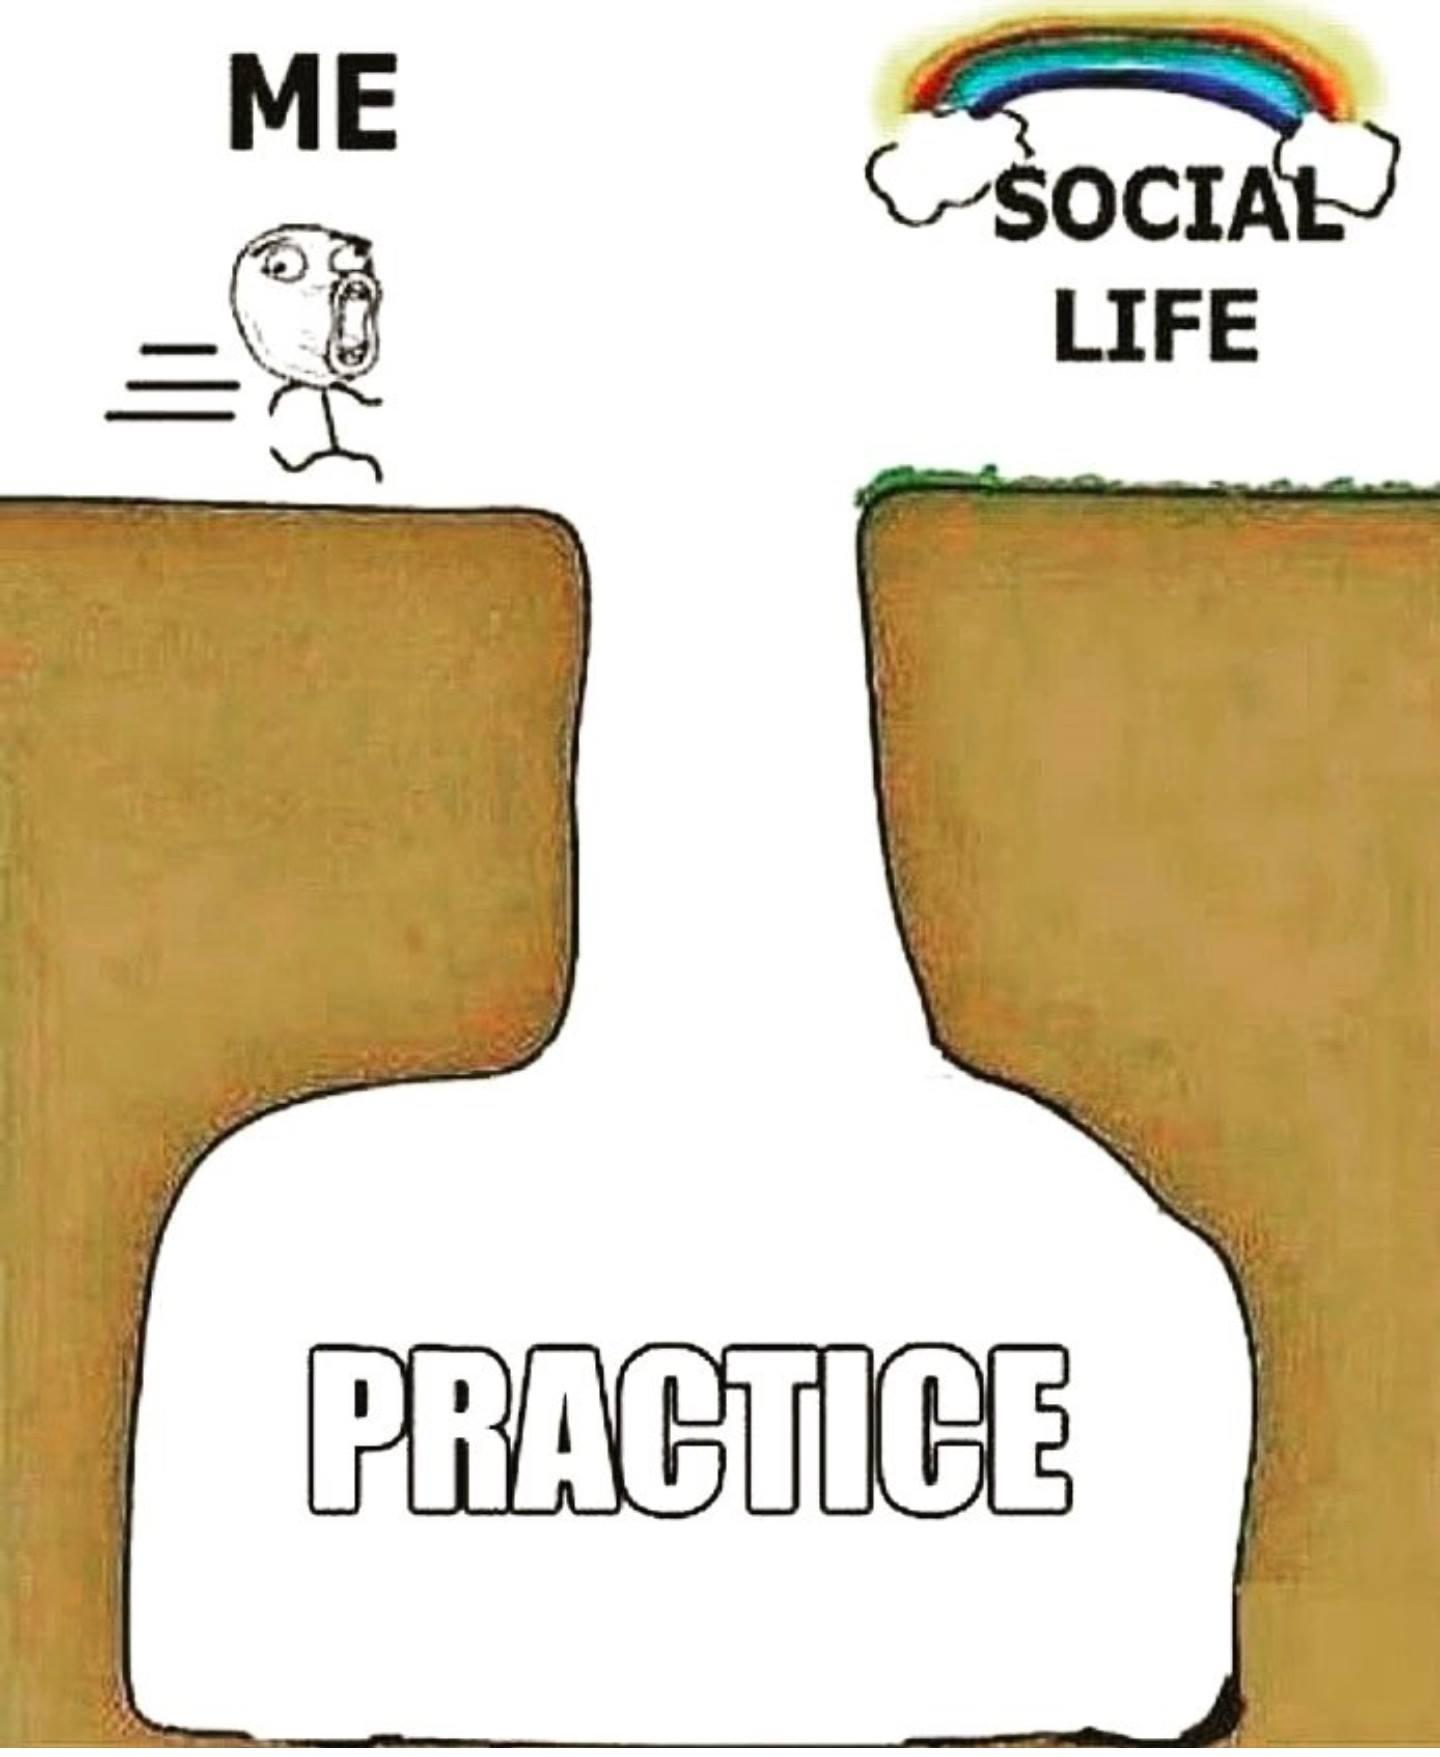 social life practice meme